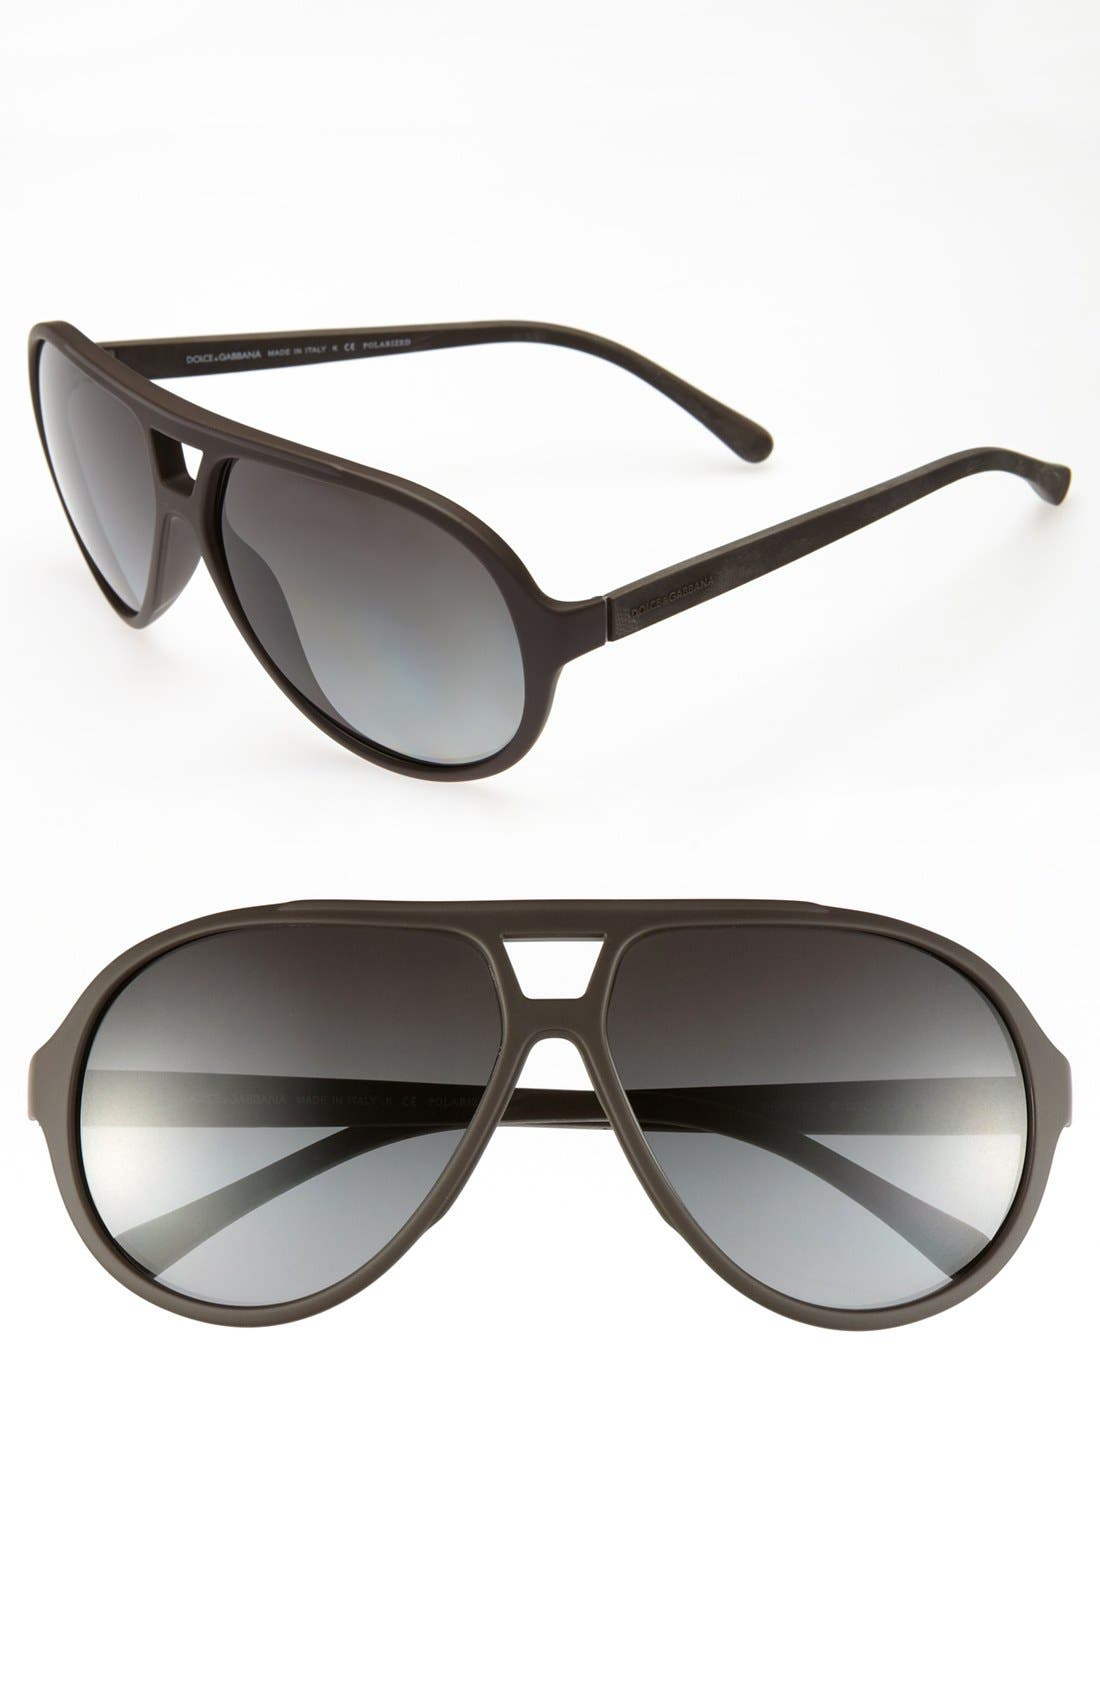 Main Image - Dolce&Gabbana 61mm Polarized Aviator Sunglasses